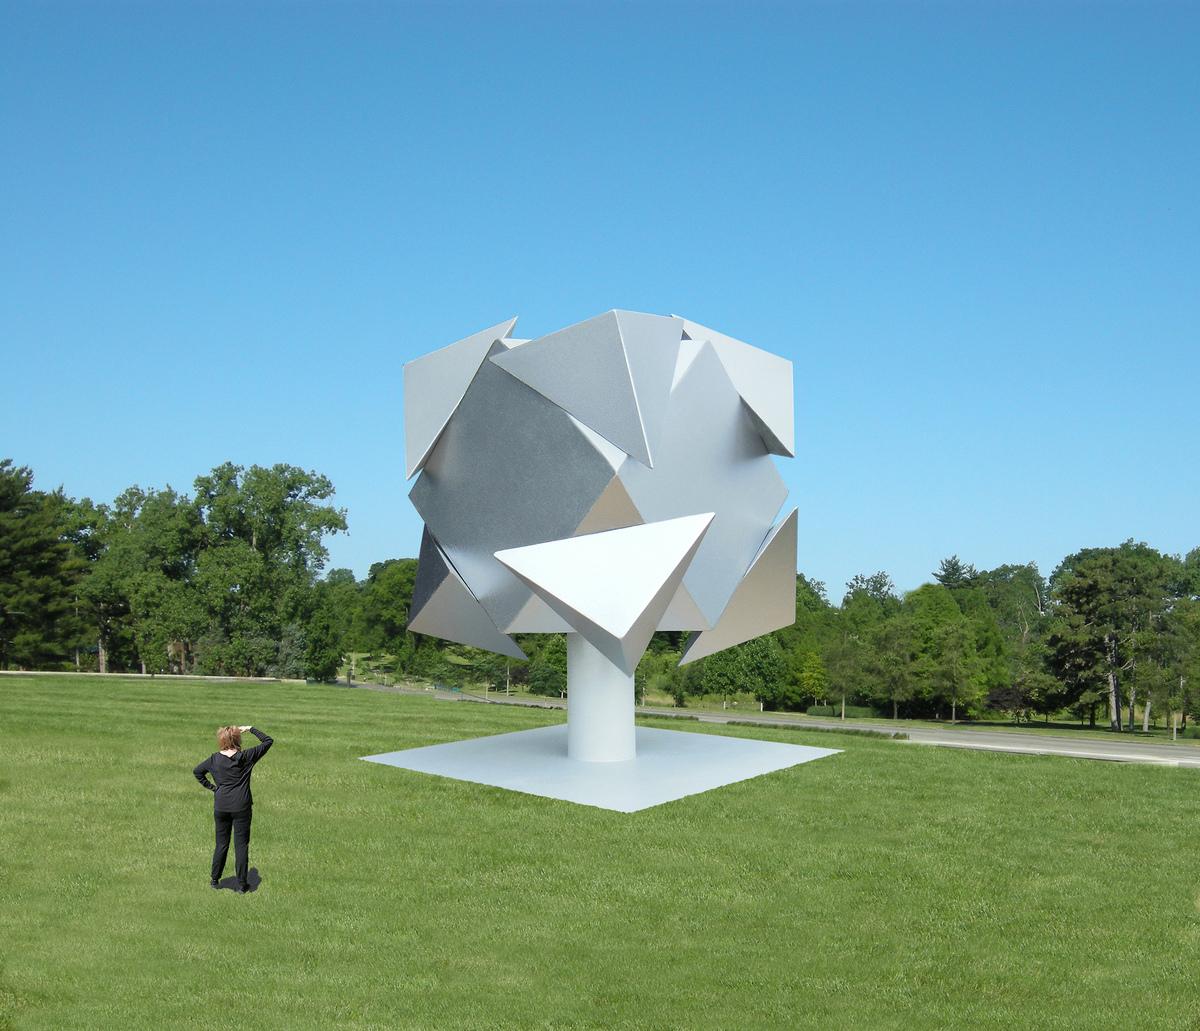 A public art installation proposal.